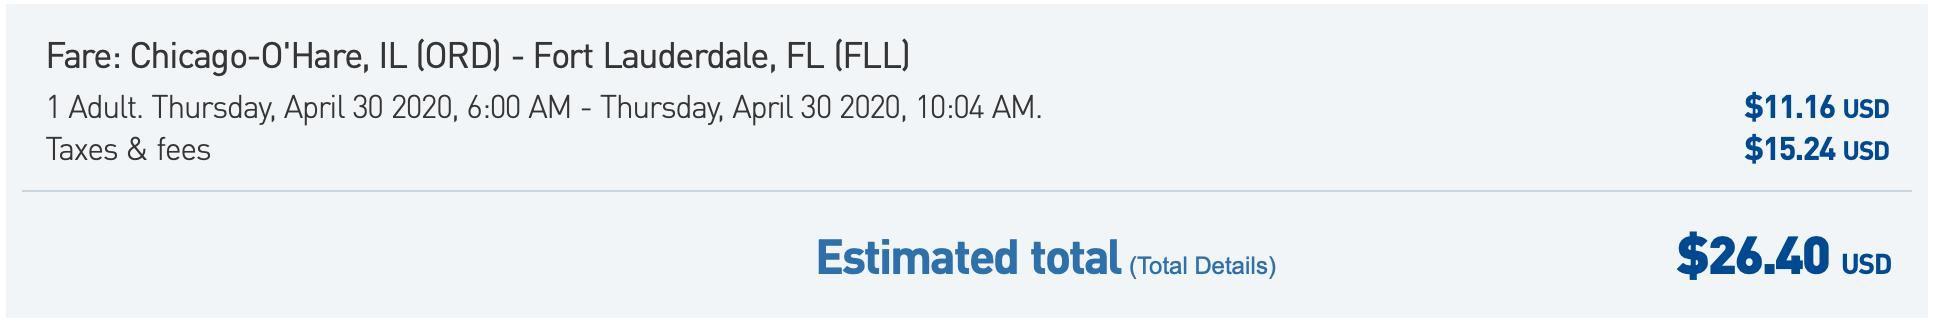 Deal alert: Flights to Florida starting at $26 one-way